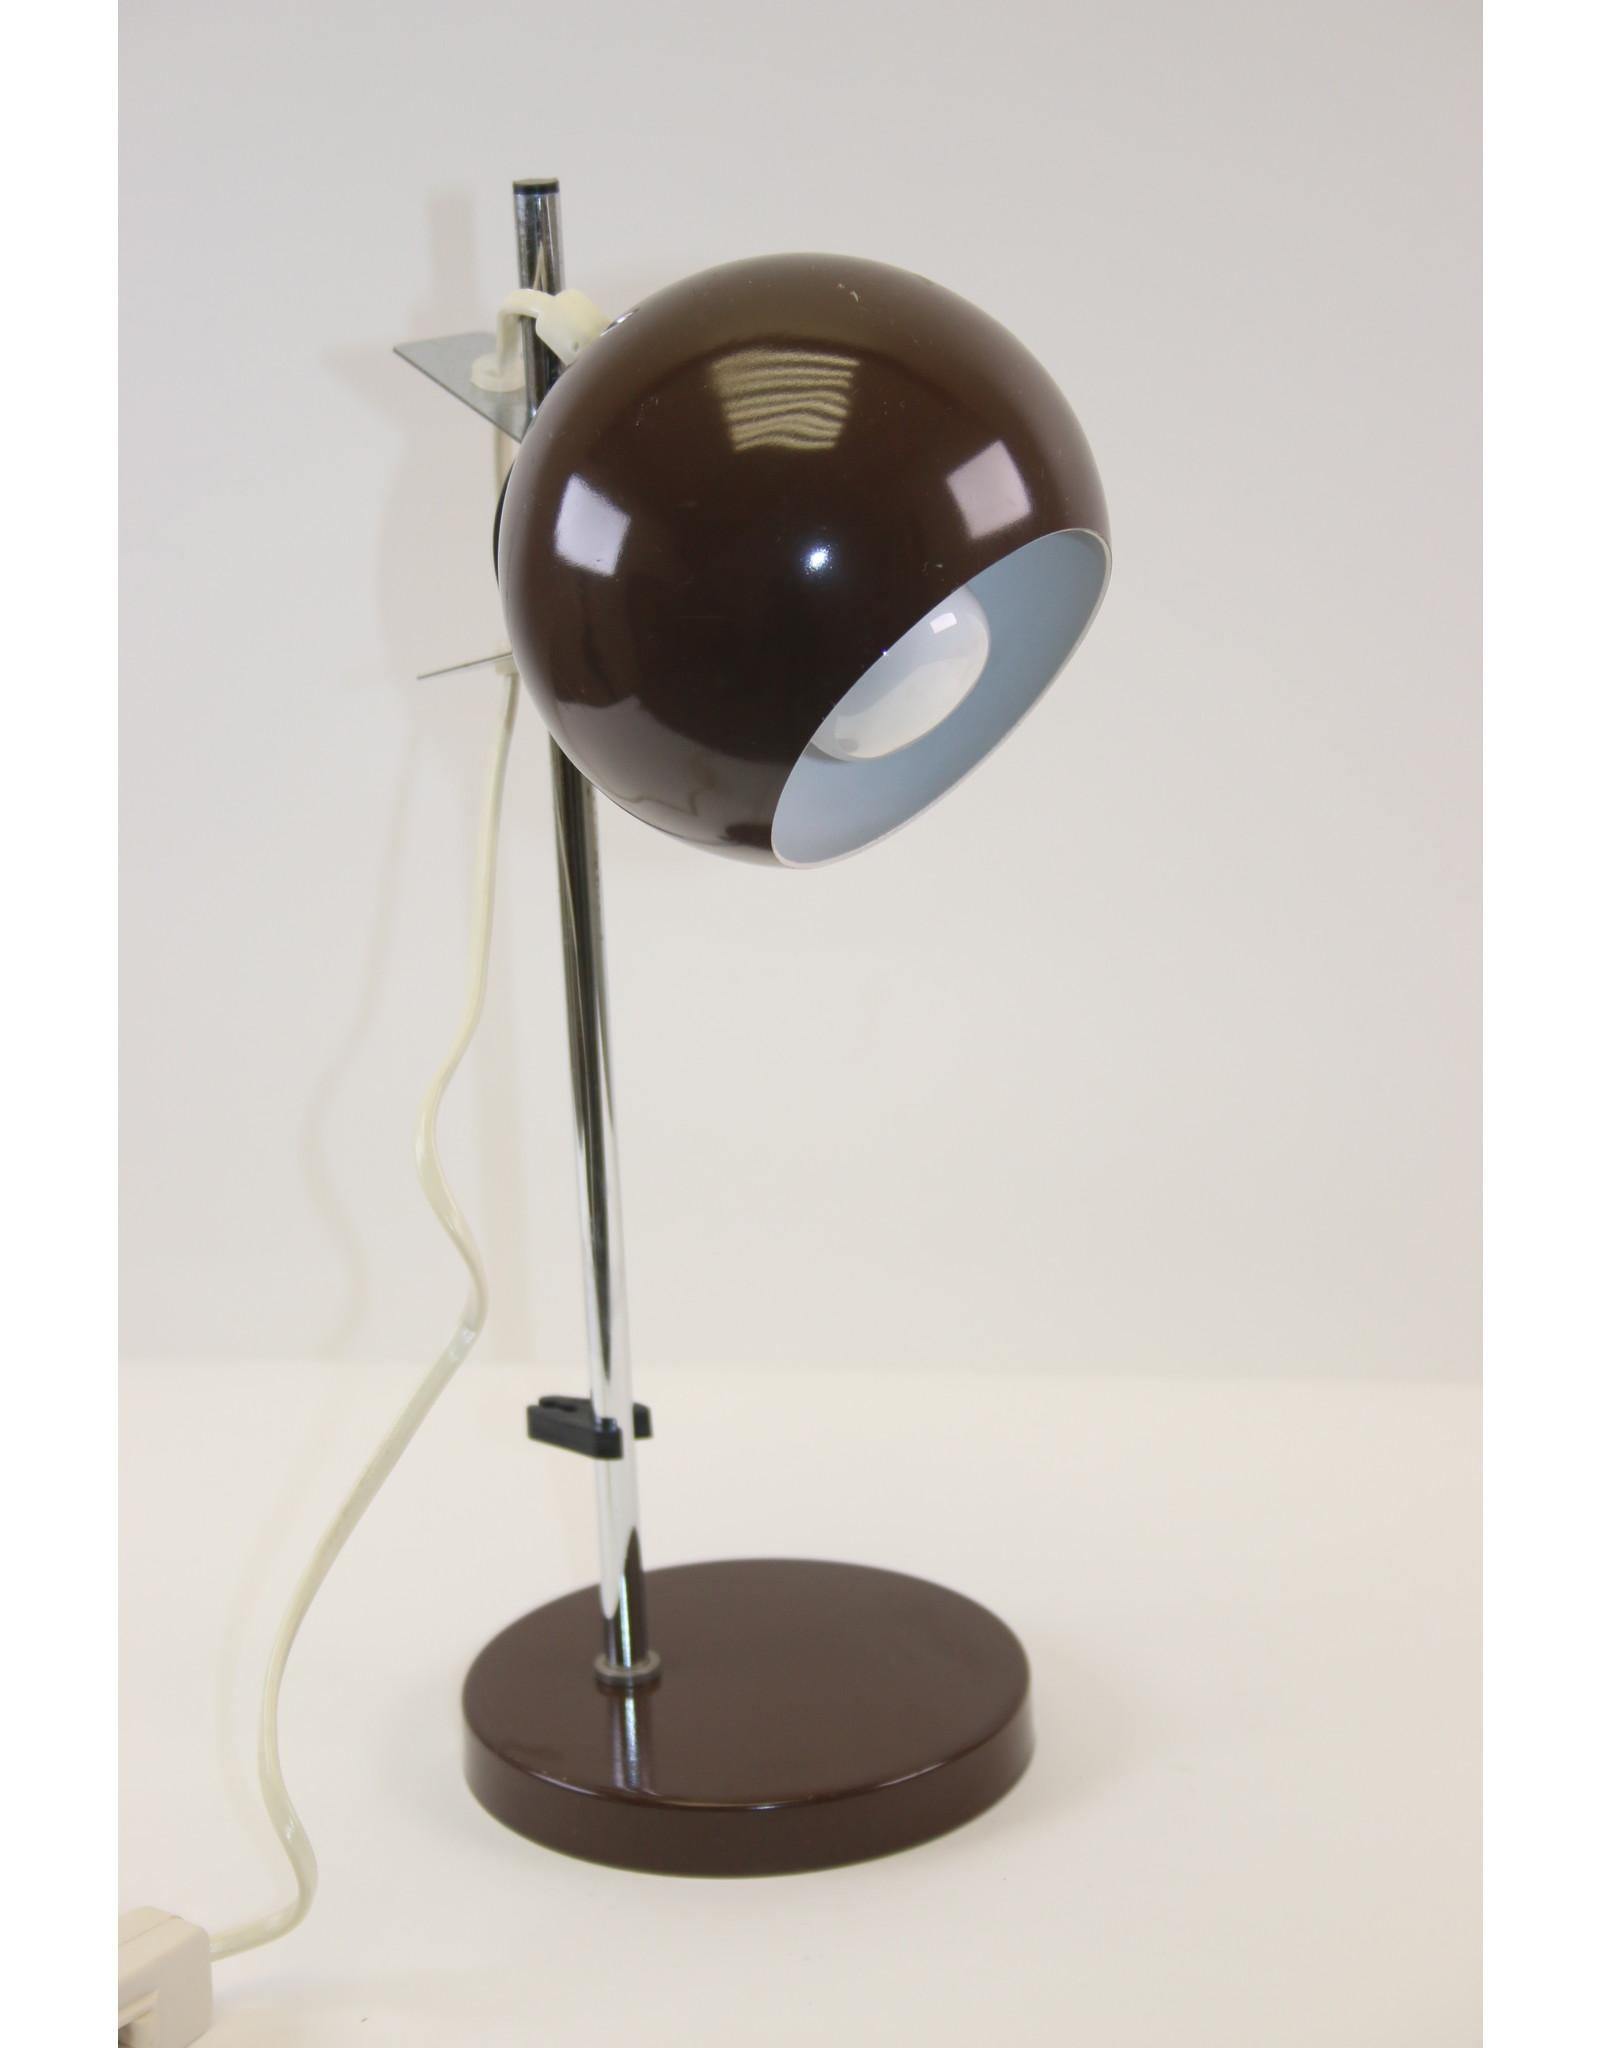 Bruine Bol Magneet Bureaulamp van Hamalux